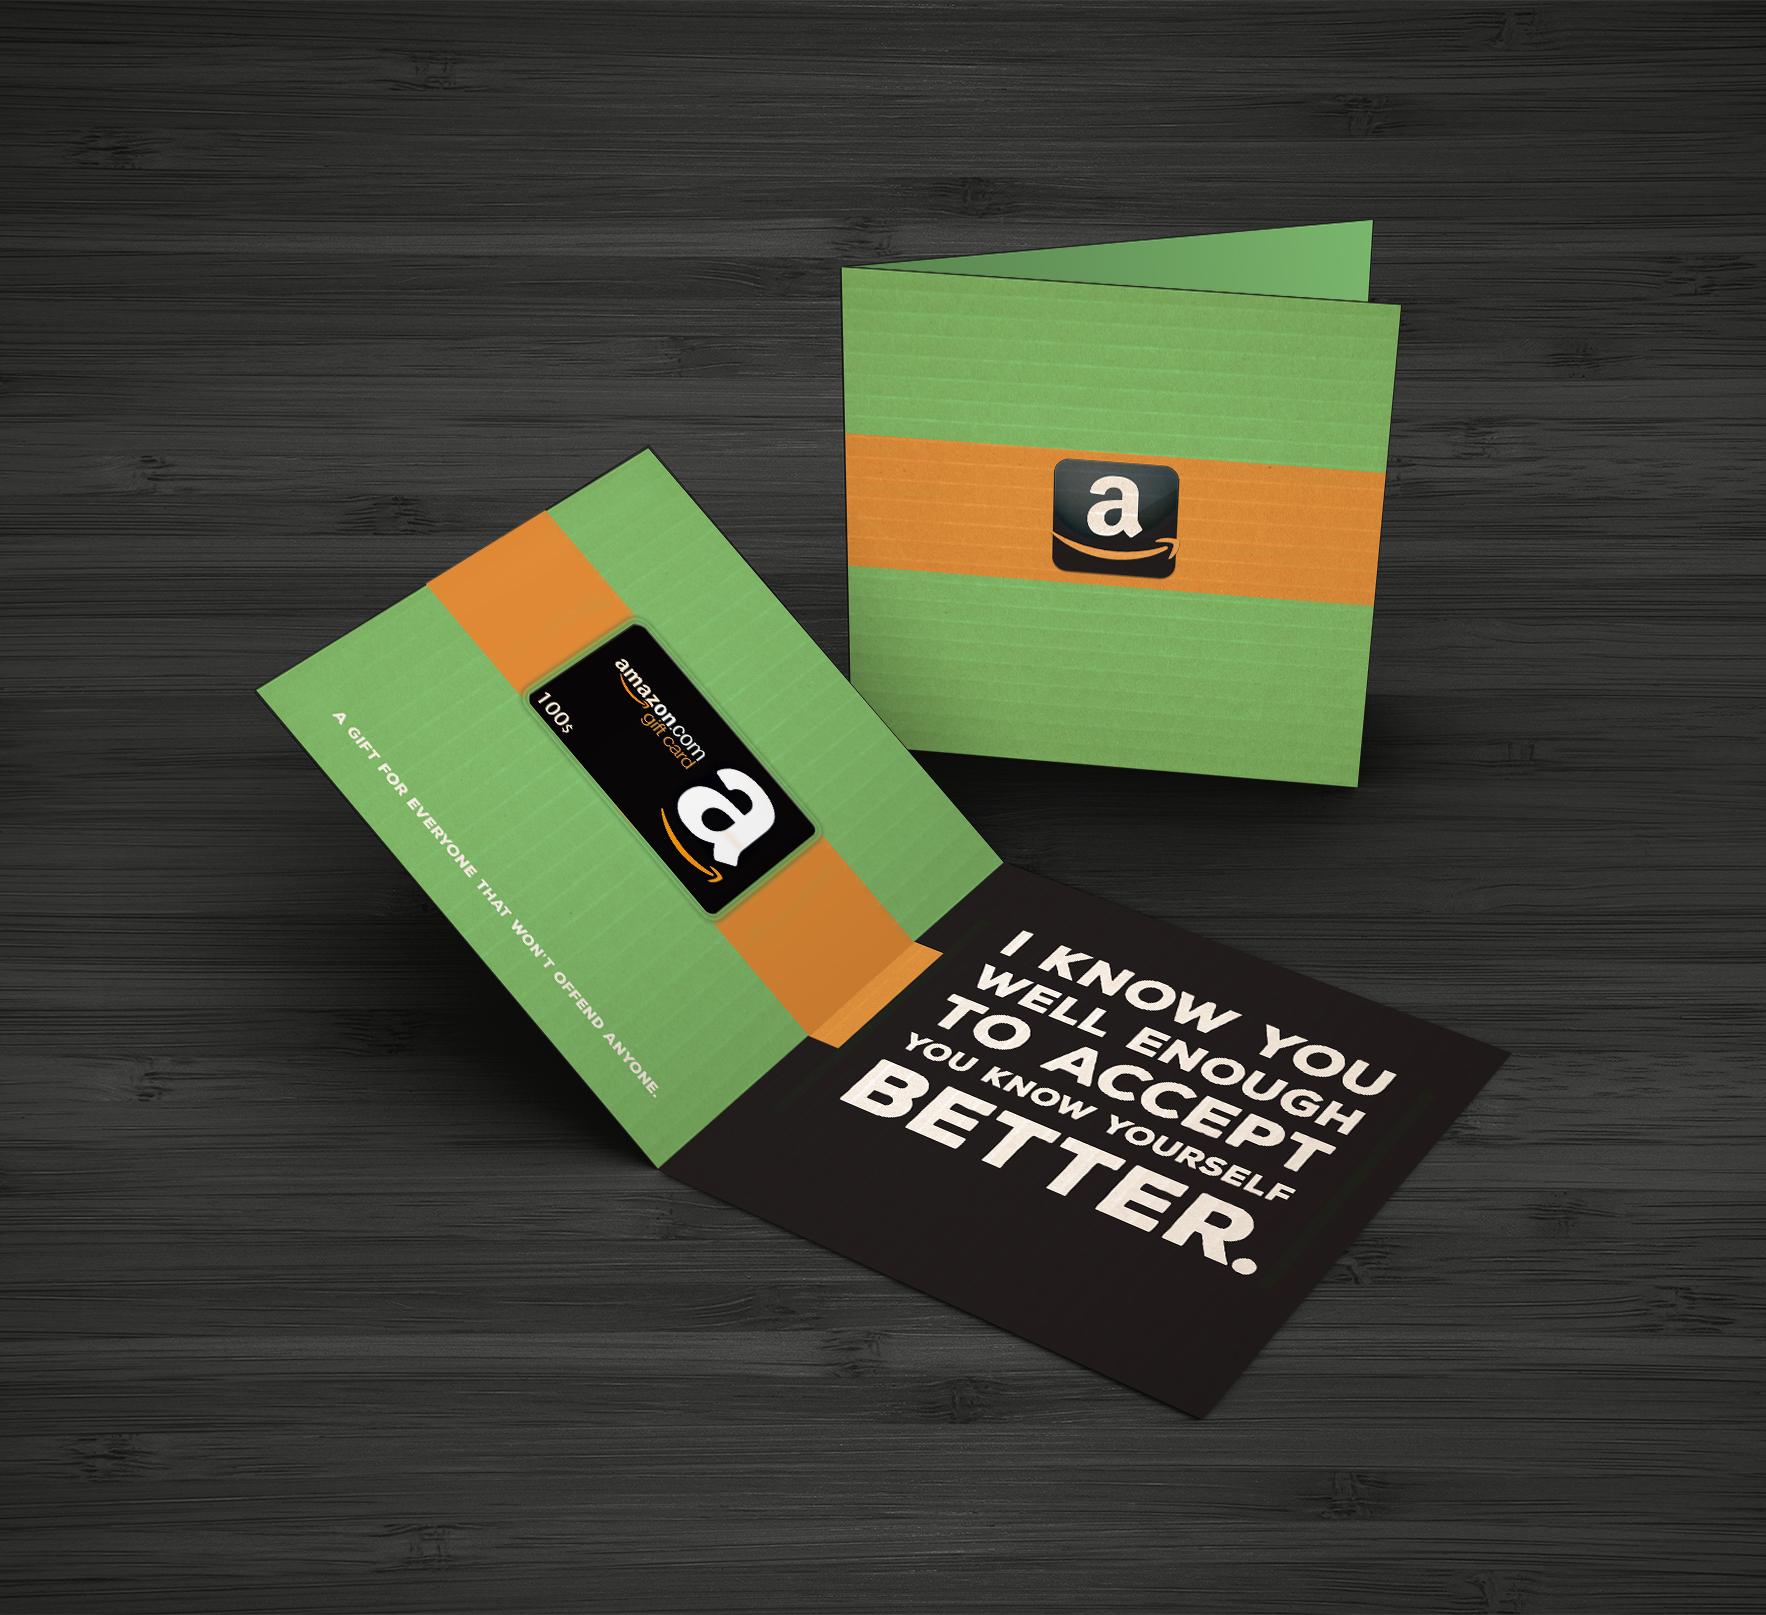 Amazon_Greetings Card Mockup_1.jpg